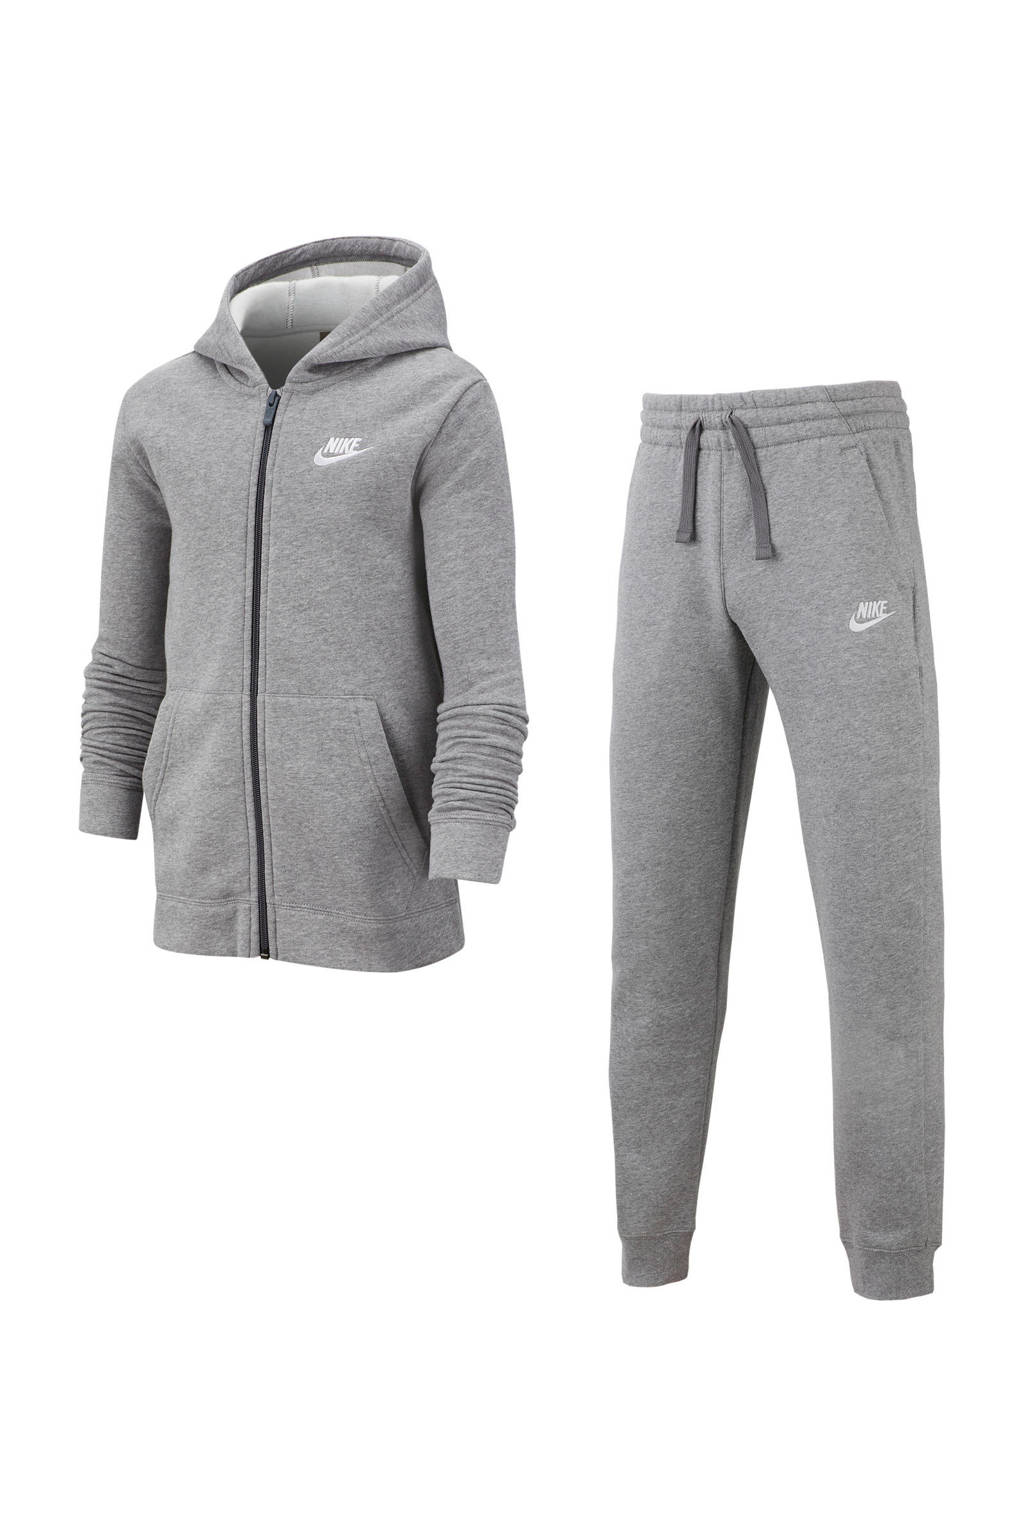 Nike   trainingspak grijs melange, donkergrijs/antraciet/wit